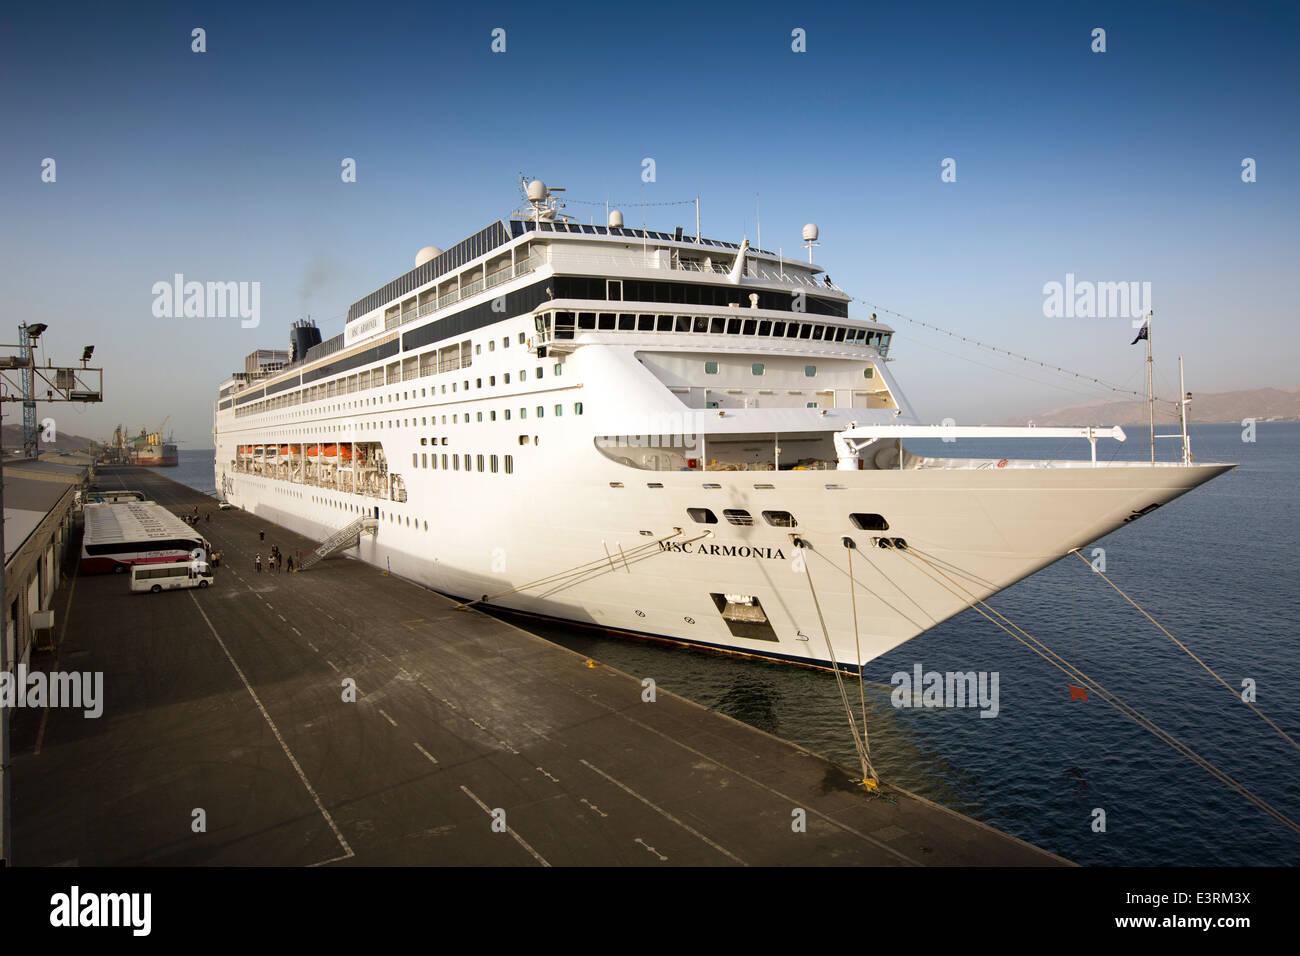 Jordan, Aqaba Port, MSC Cruise ship Armonia, moored in the dock Stock Photo